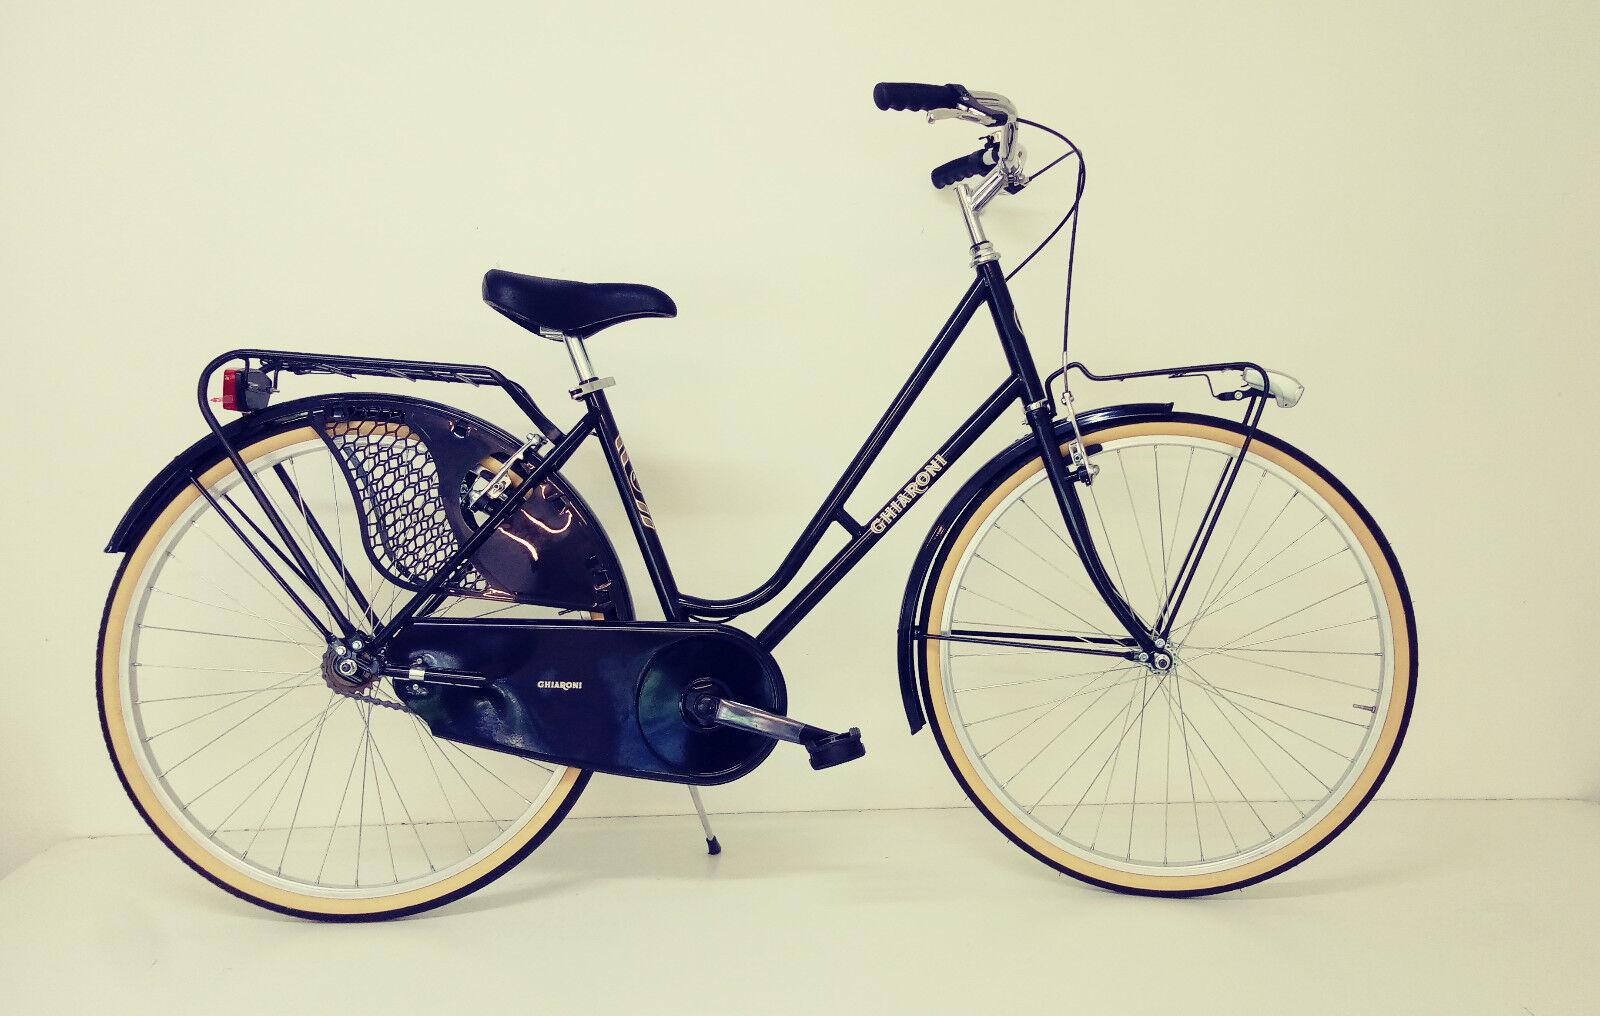 BICI CITY BIKE Bicicletta HOLLAND HOLLAND Bicicletta DONNA 26